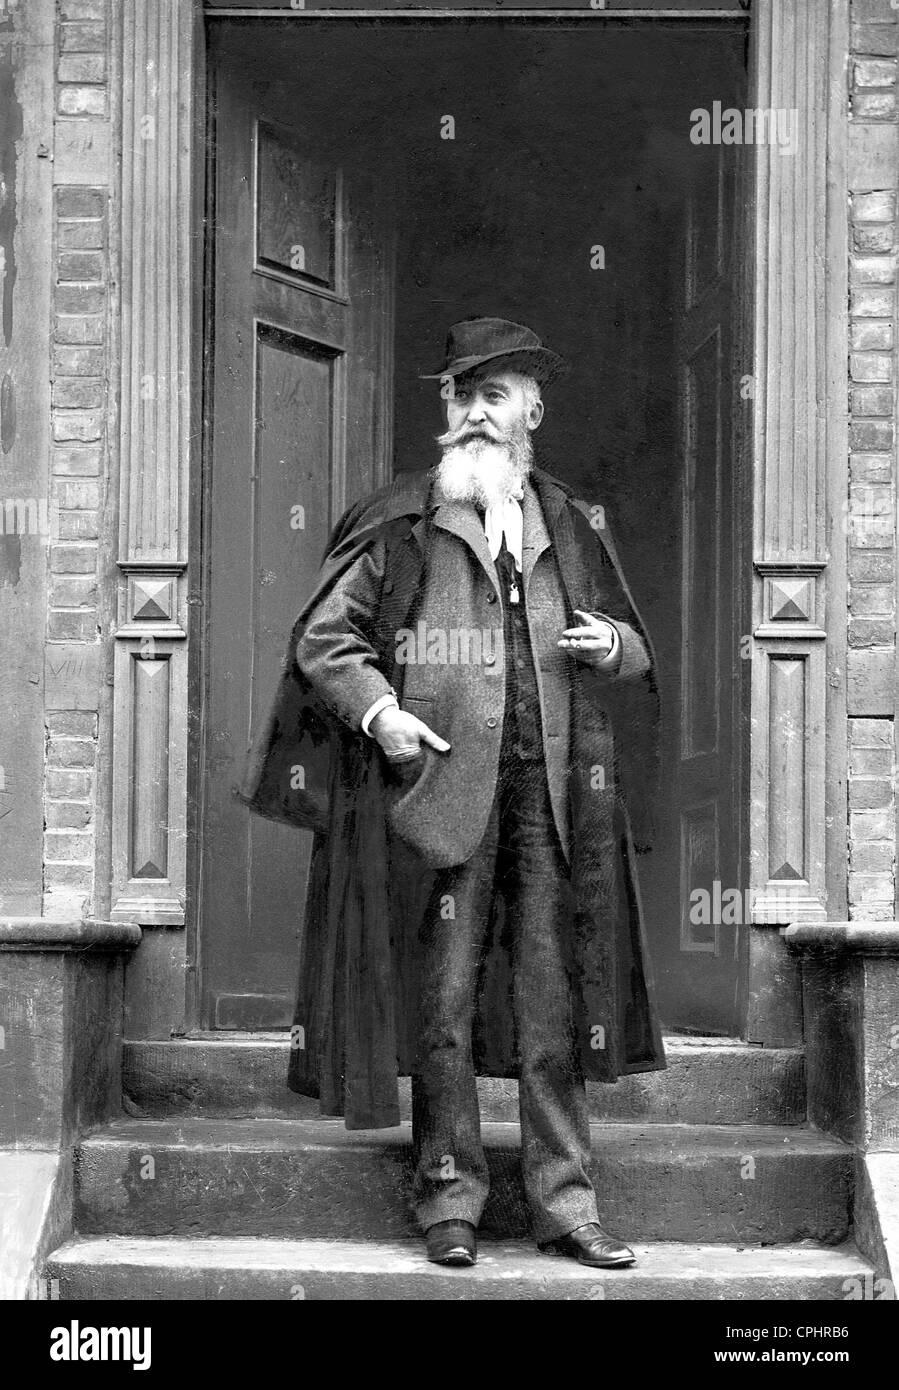 German writer, painter and illustrator Wilhelm Busch (1832-1908). Stock Photo